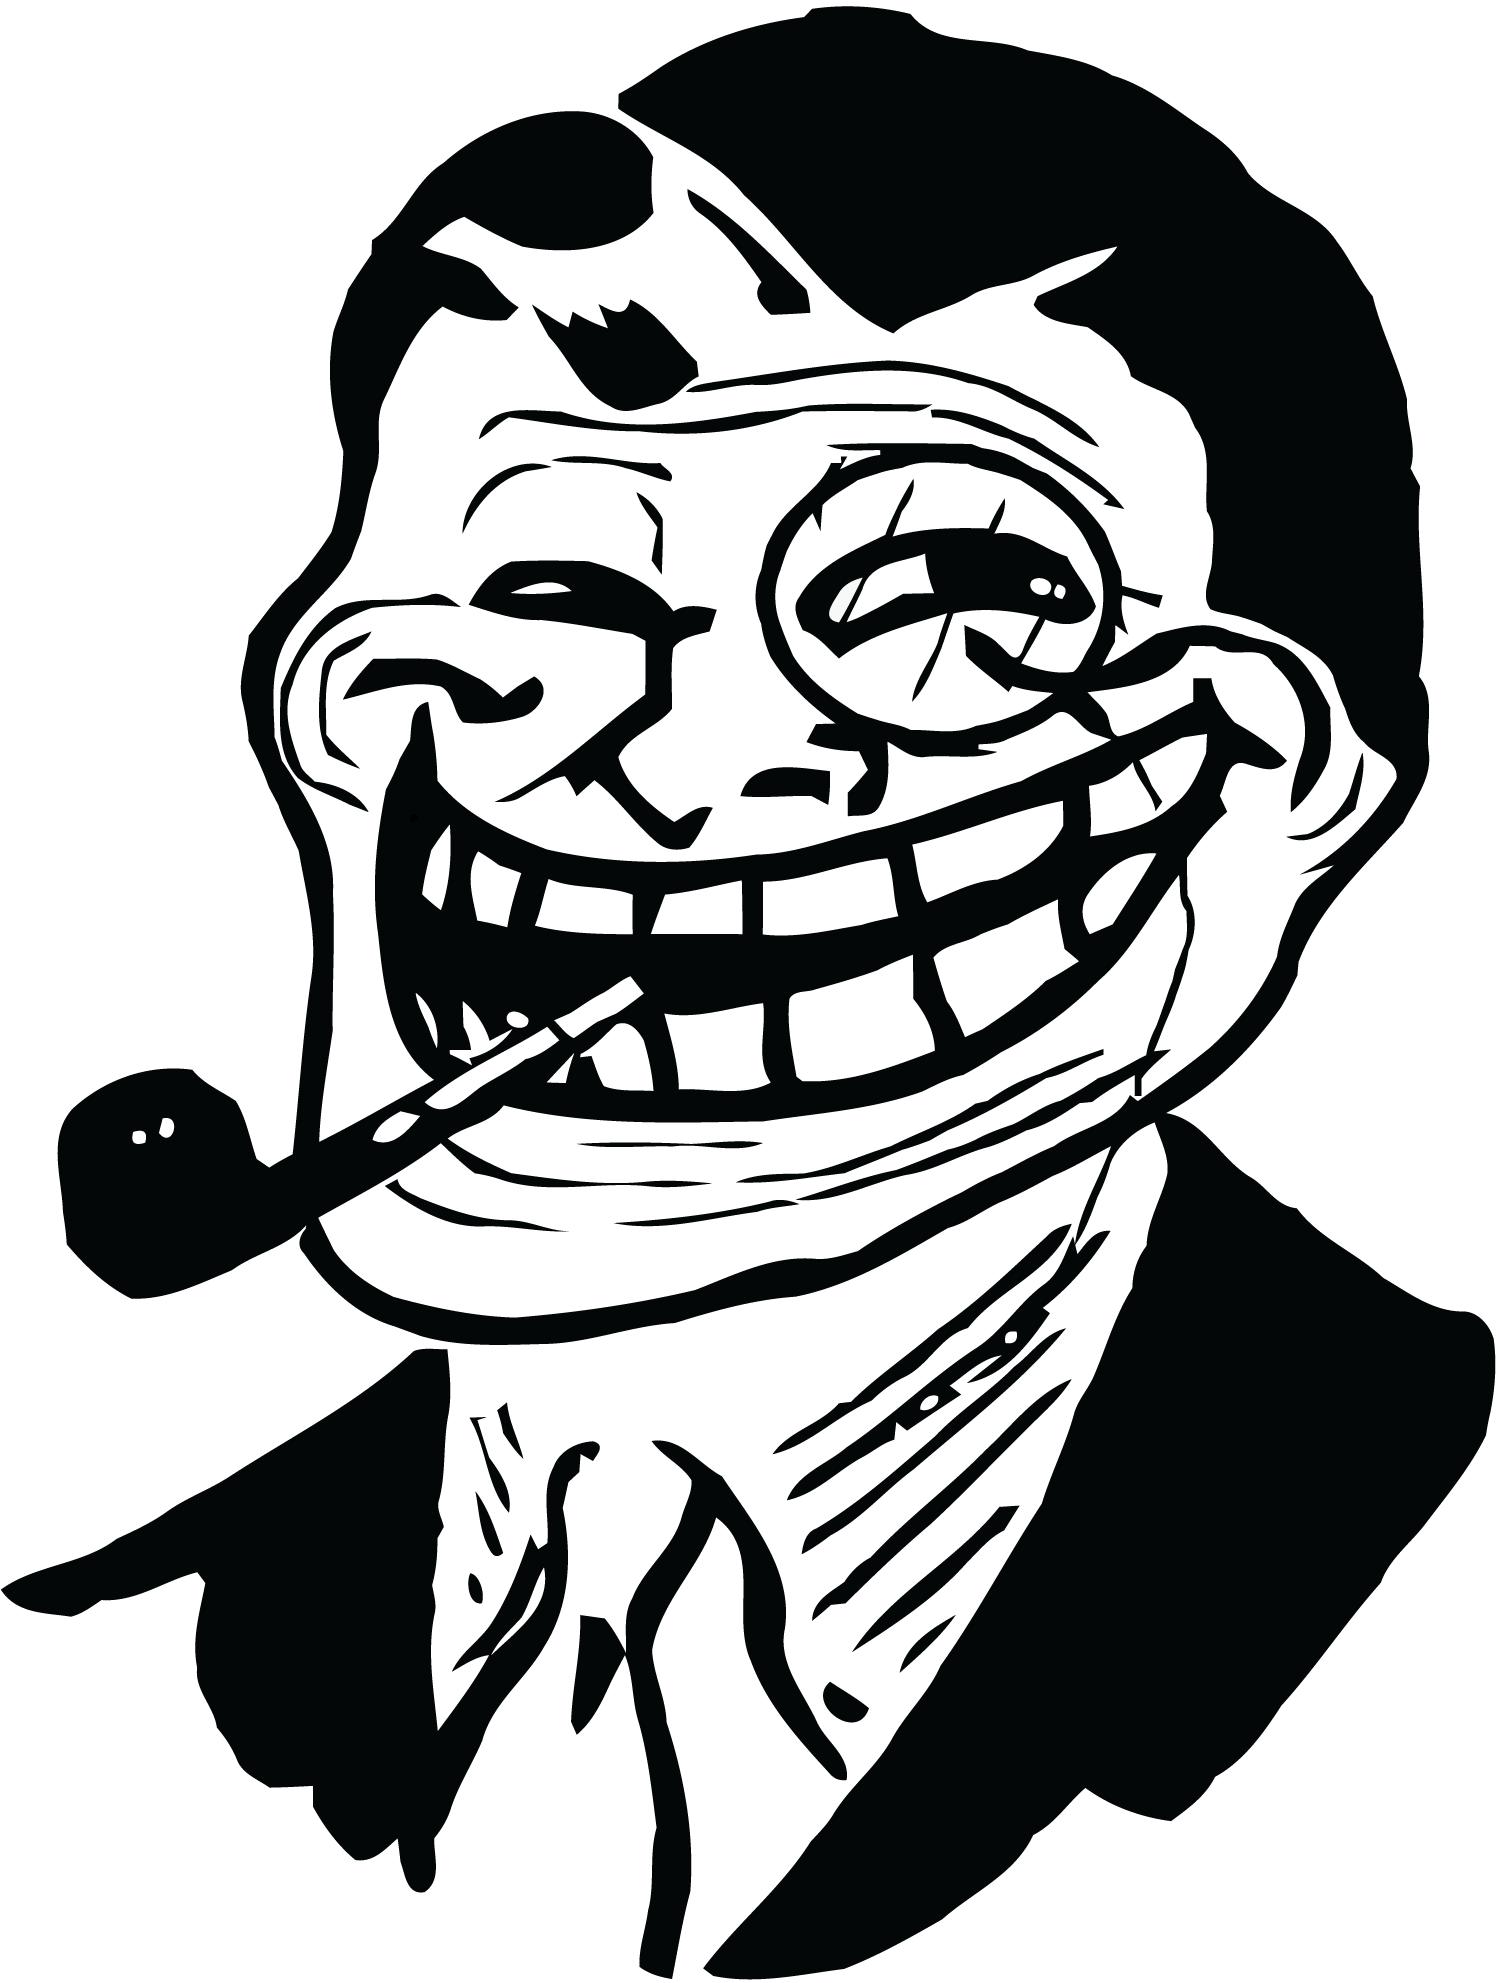 LOL U Mad Trollface Meme Face Troll Cool Internet Angry Blog Post Men/'s T-Shirt